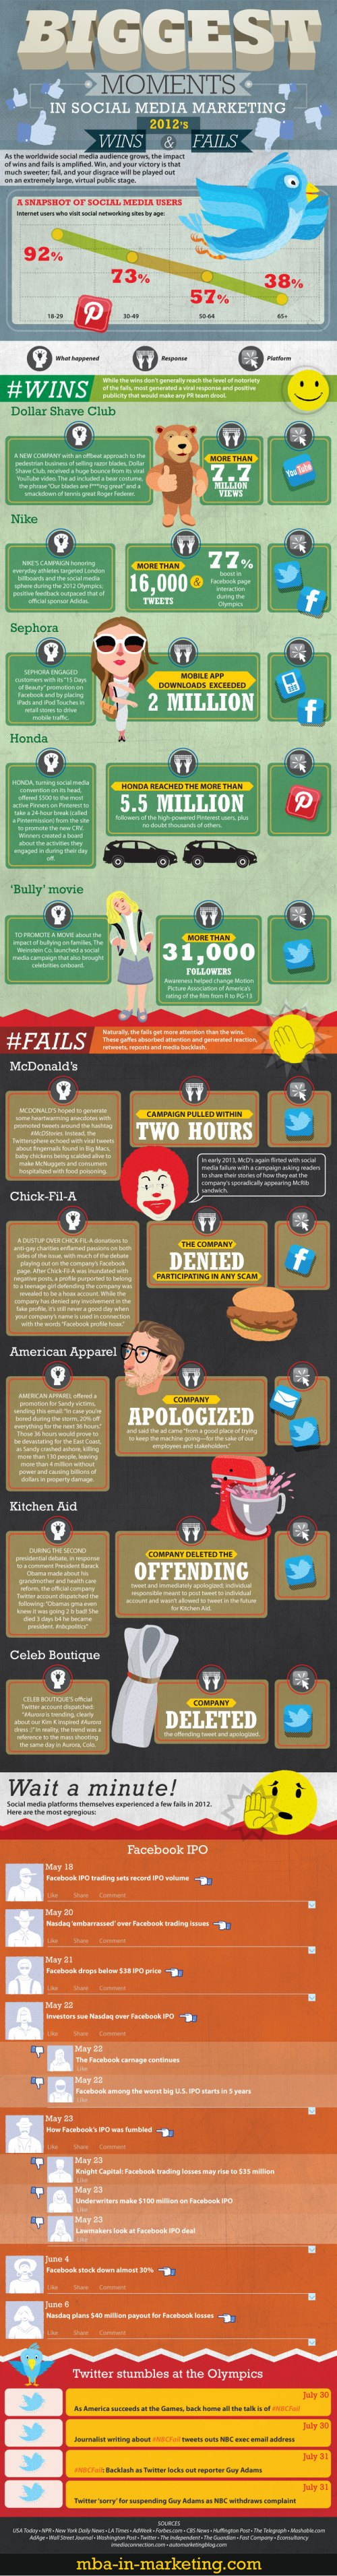 social-media-fails